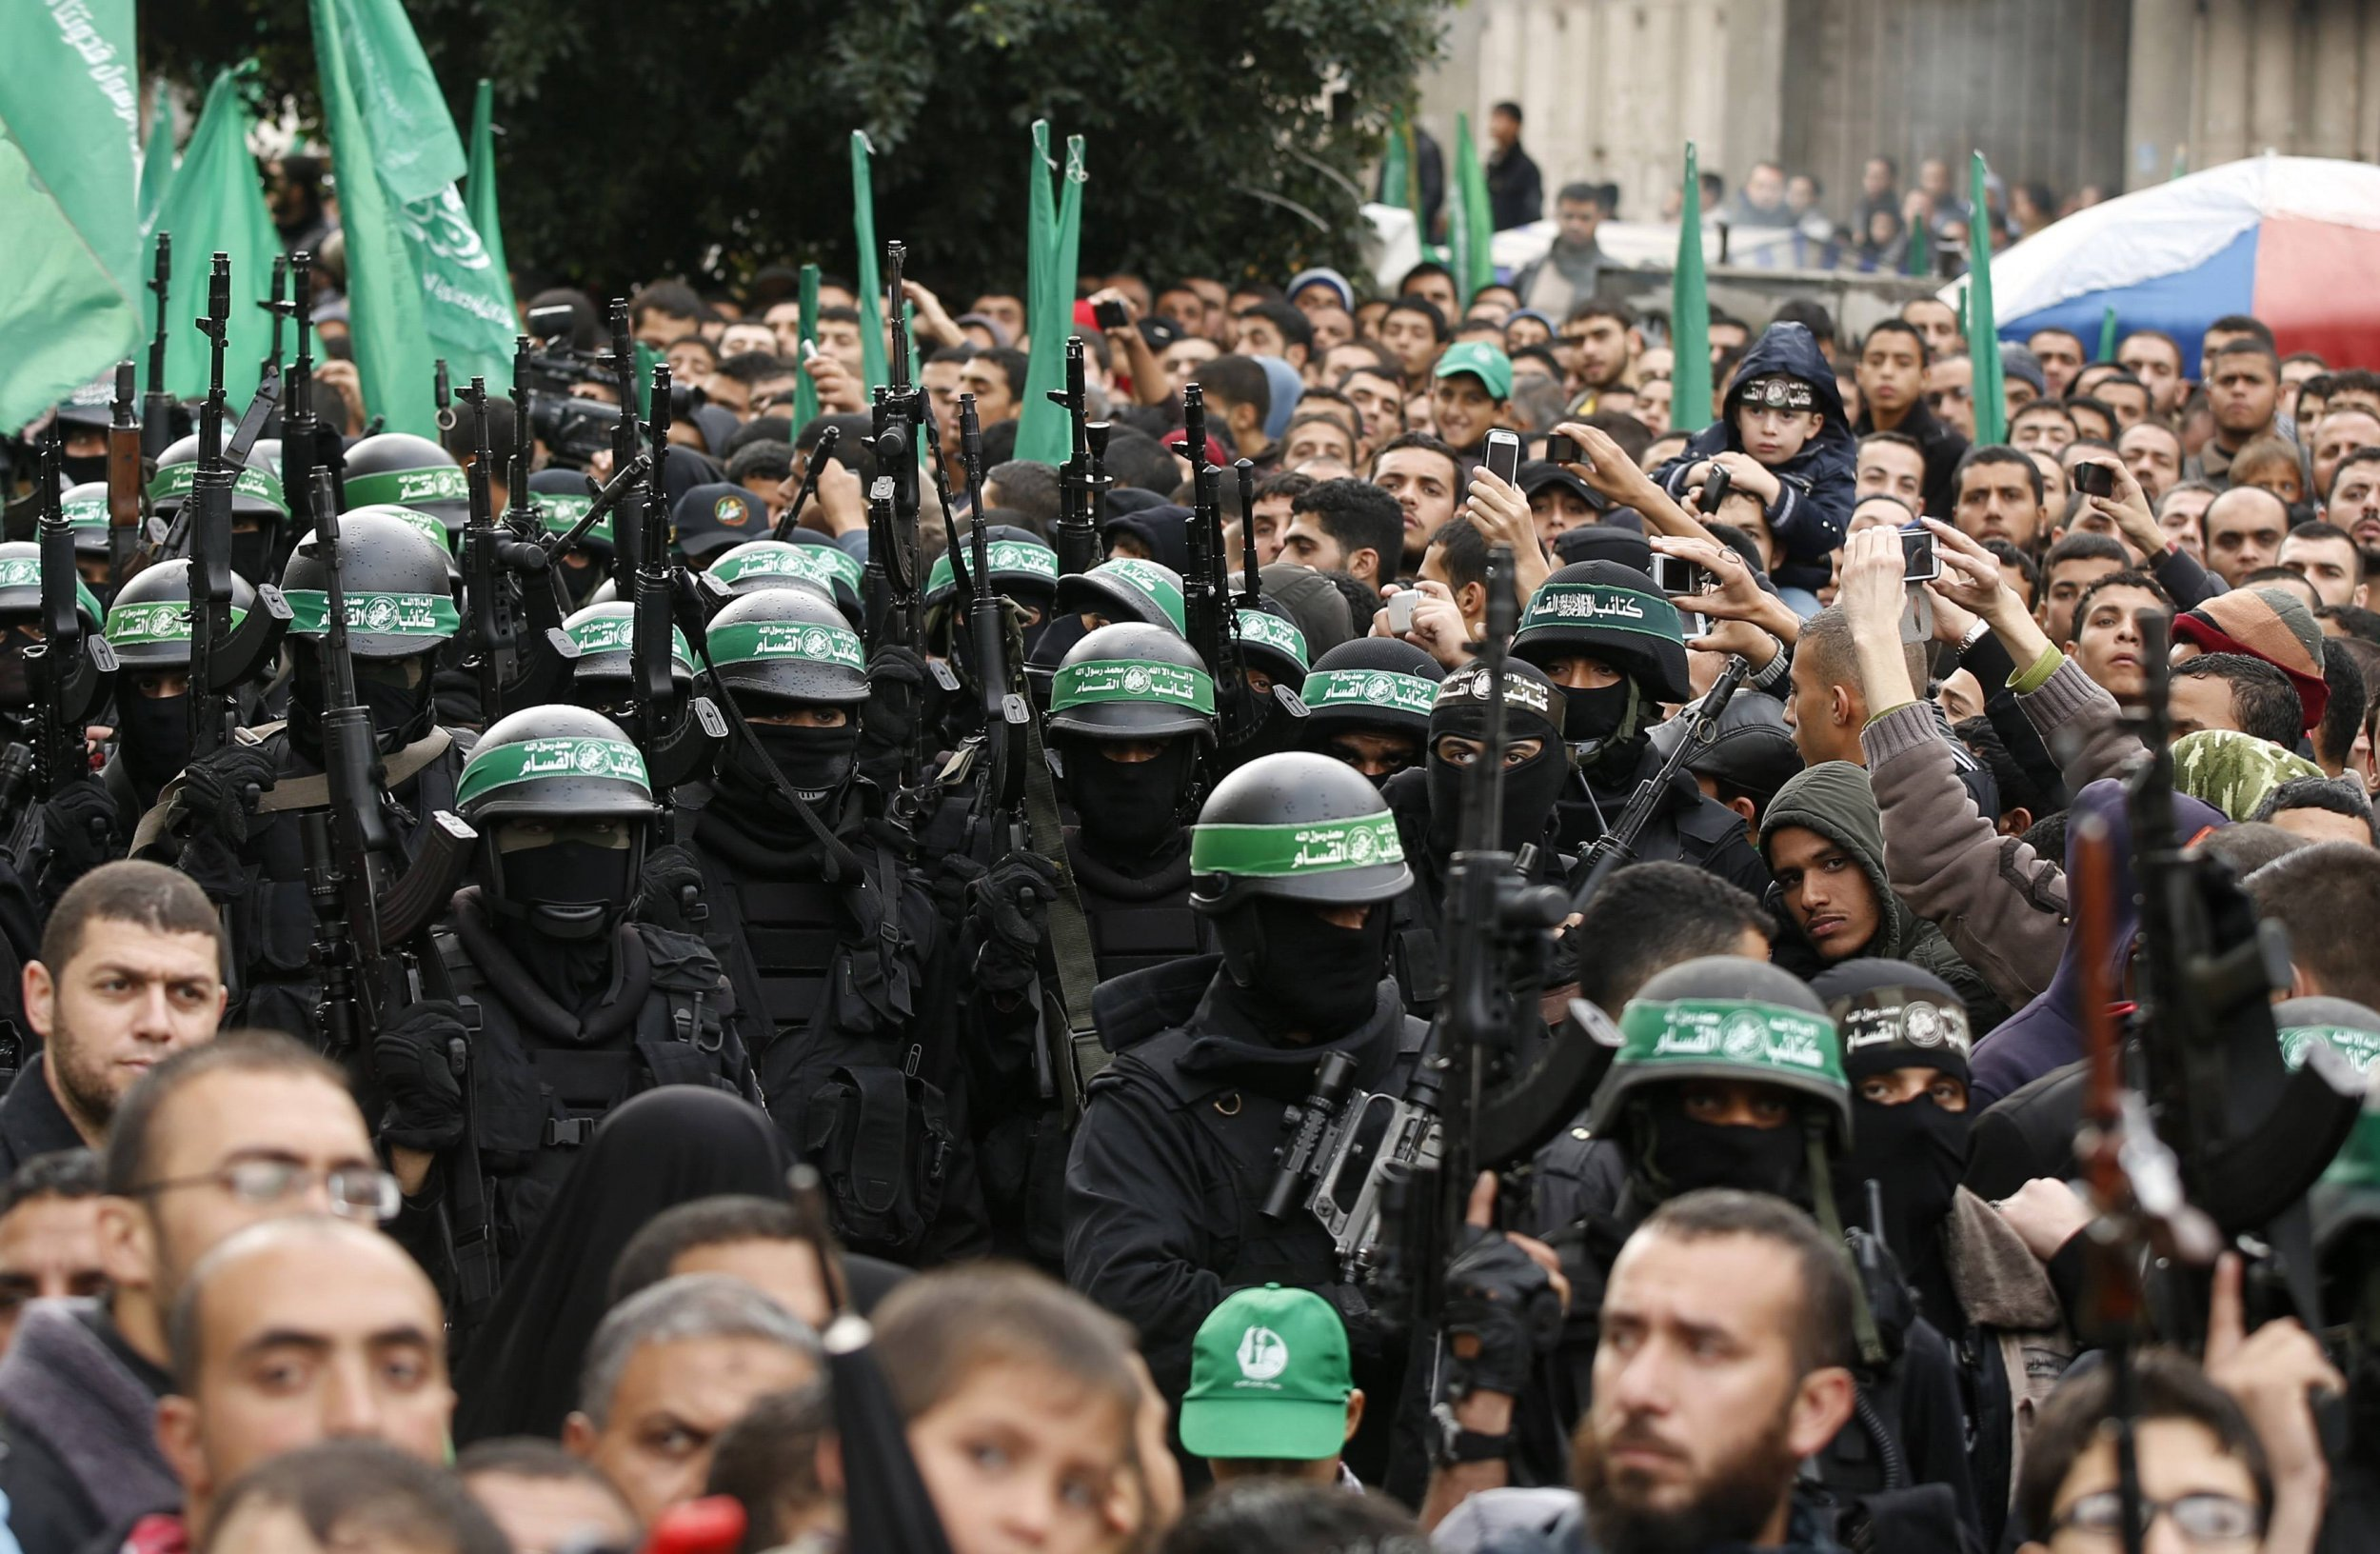 Qassam